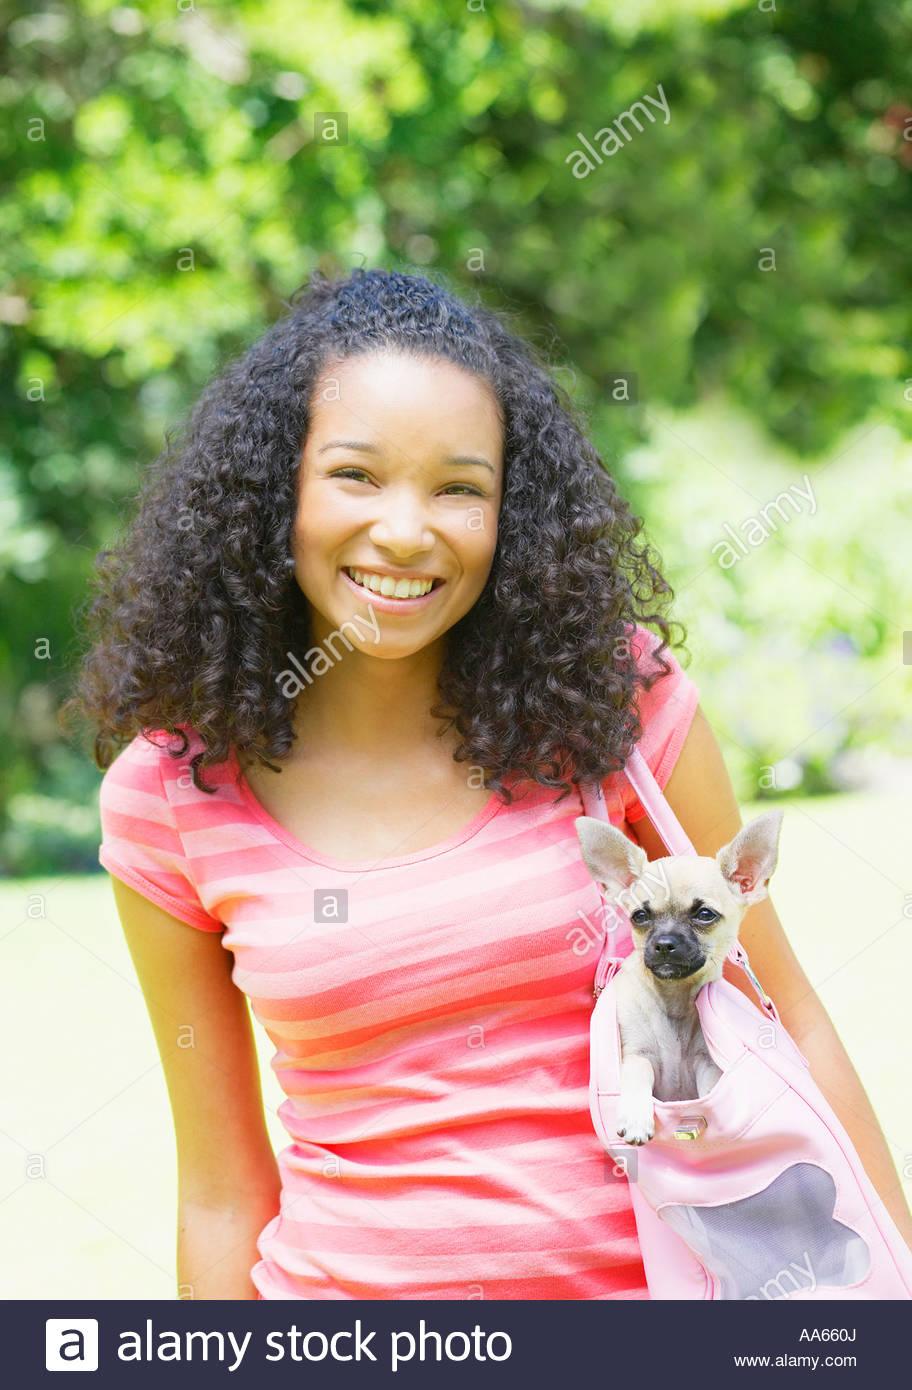 Teenage girl with puppy dog in handbag - Stock Image